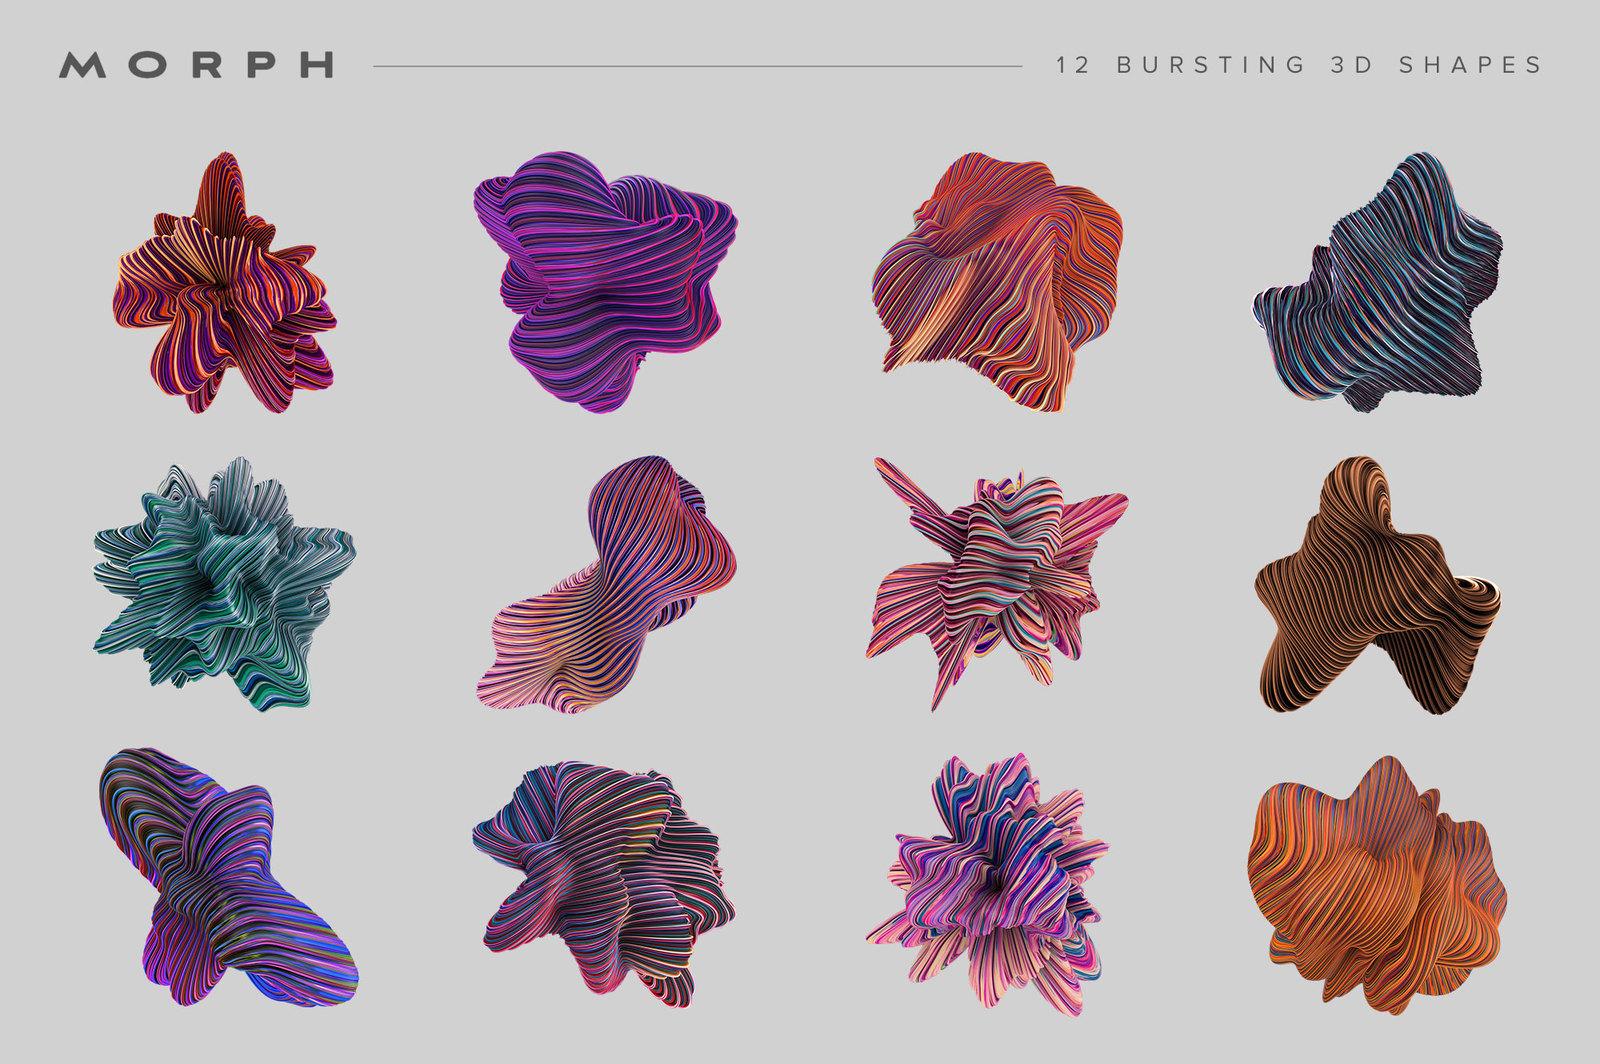 Morph: Bursting 3D Shapes